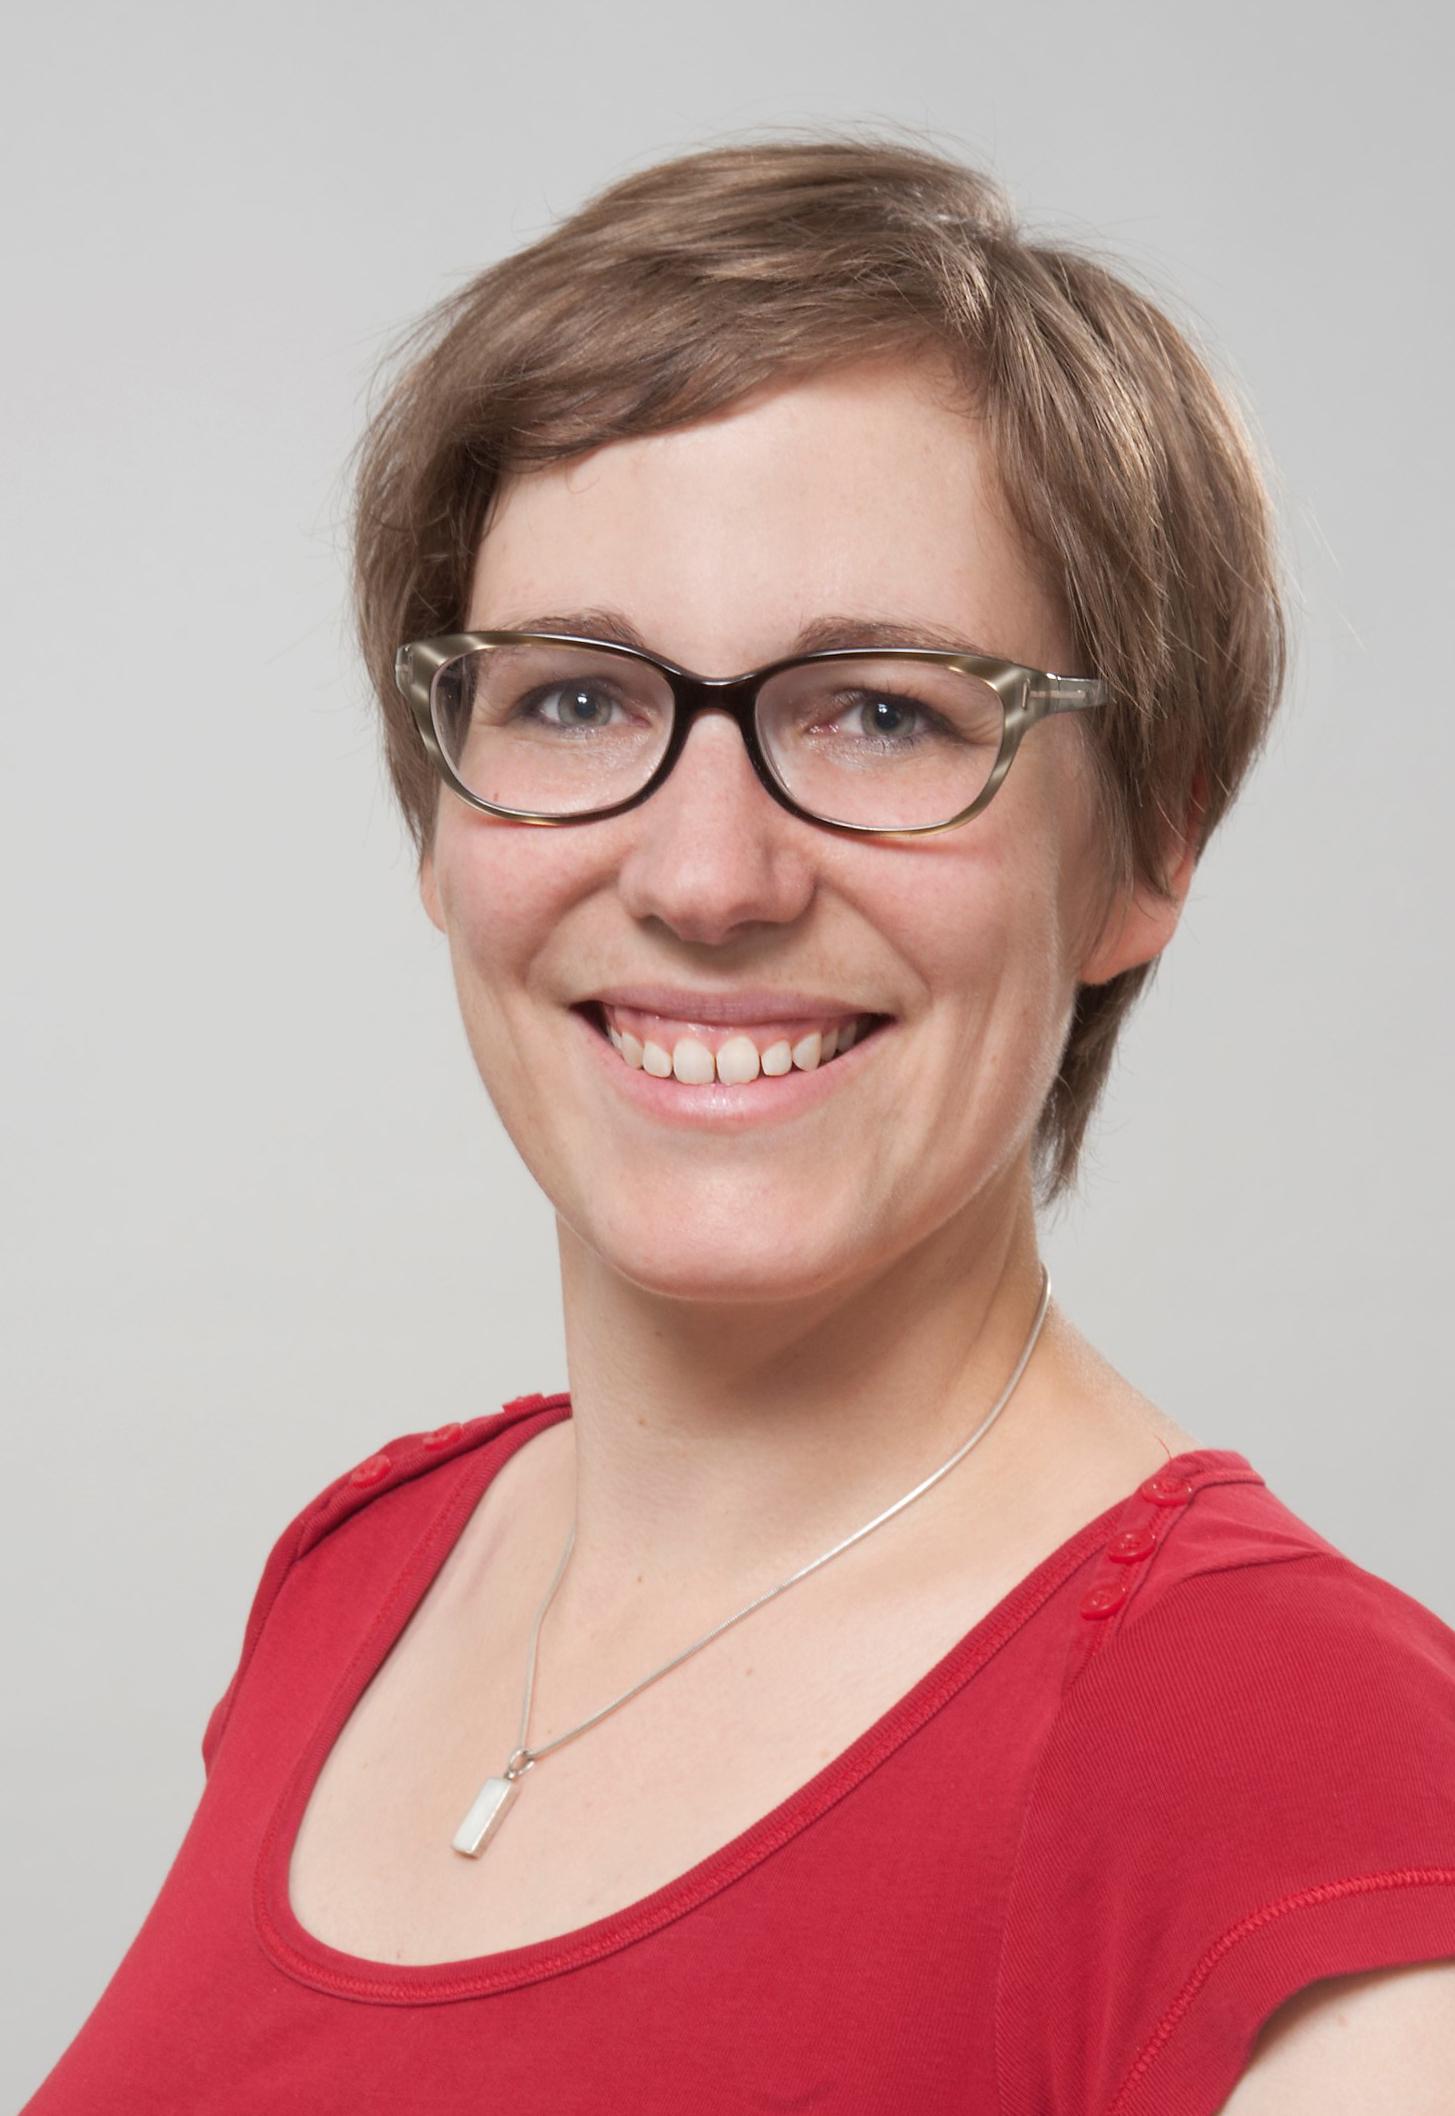 Dr. des. Susanne Rutishauser